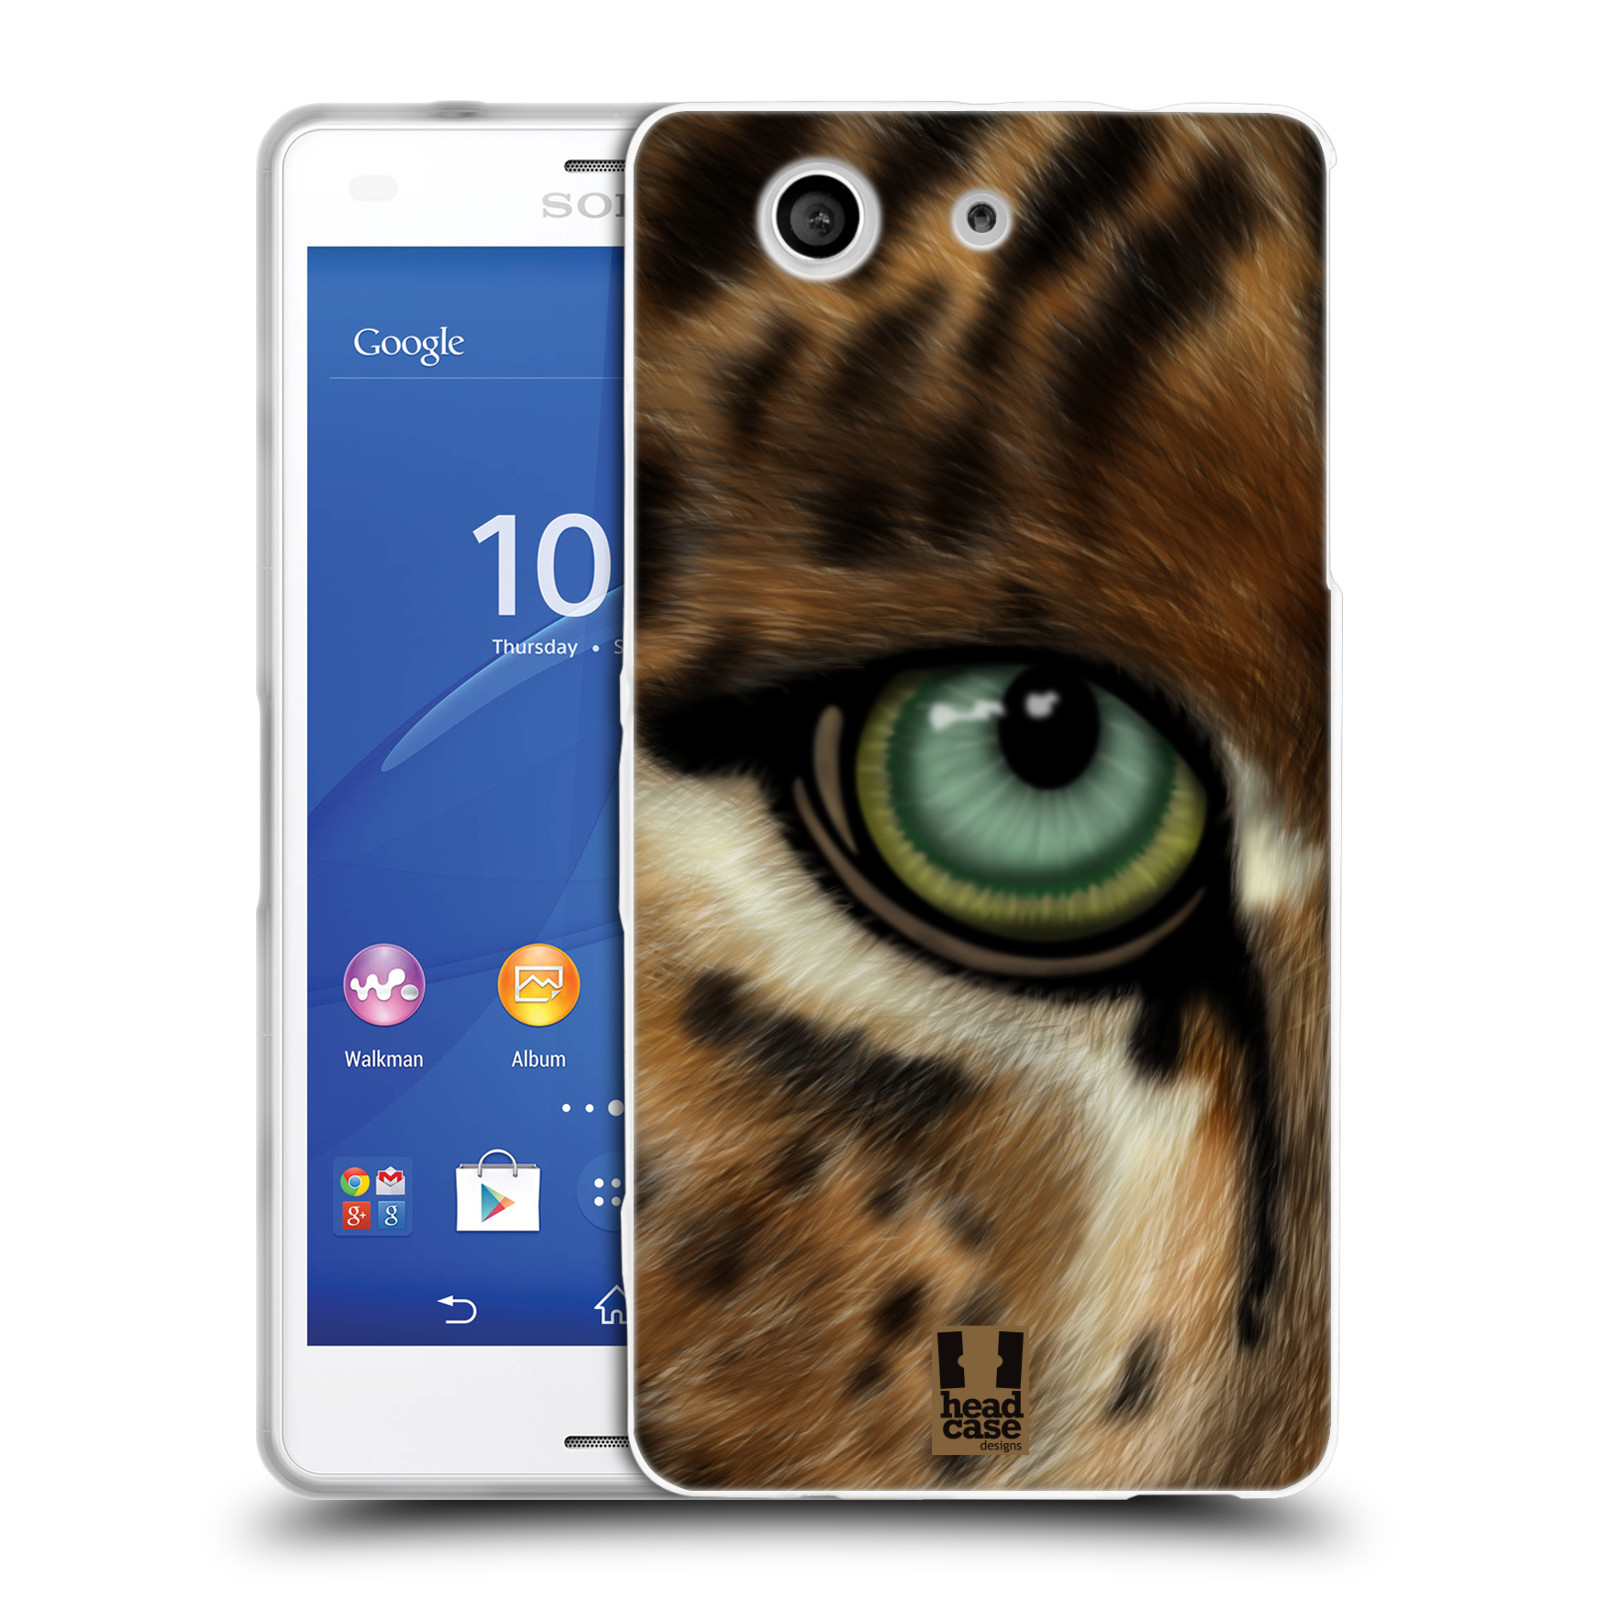 HEAD CASE silikonový obal na mobil Sony Xperia Z3 COMPACT (D5803) vzor pohled zvířete oko leopard